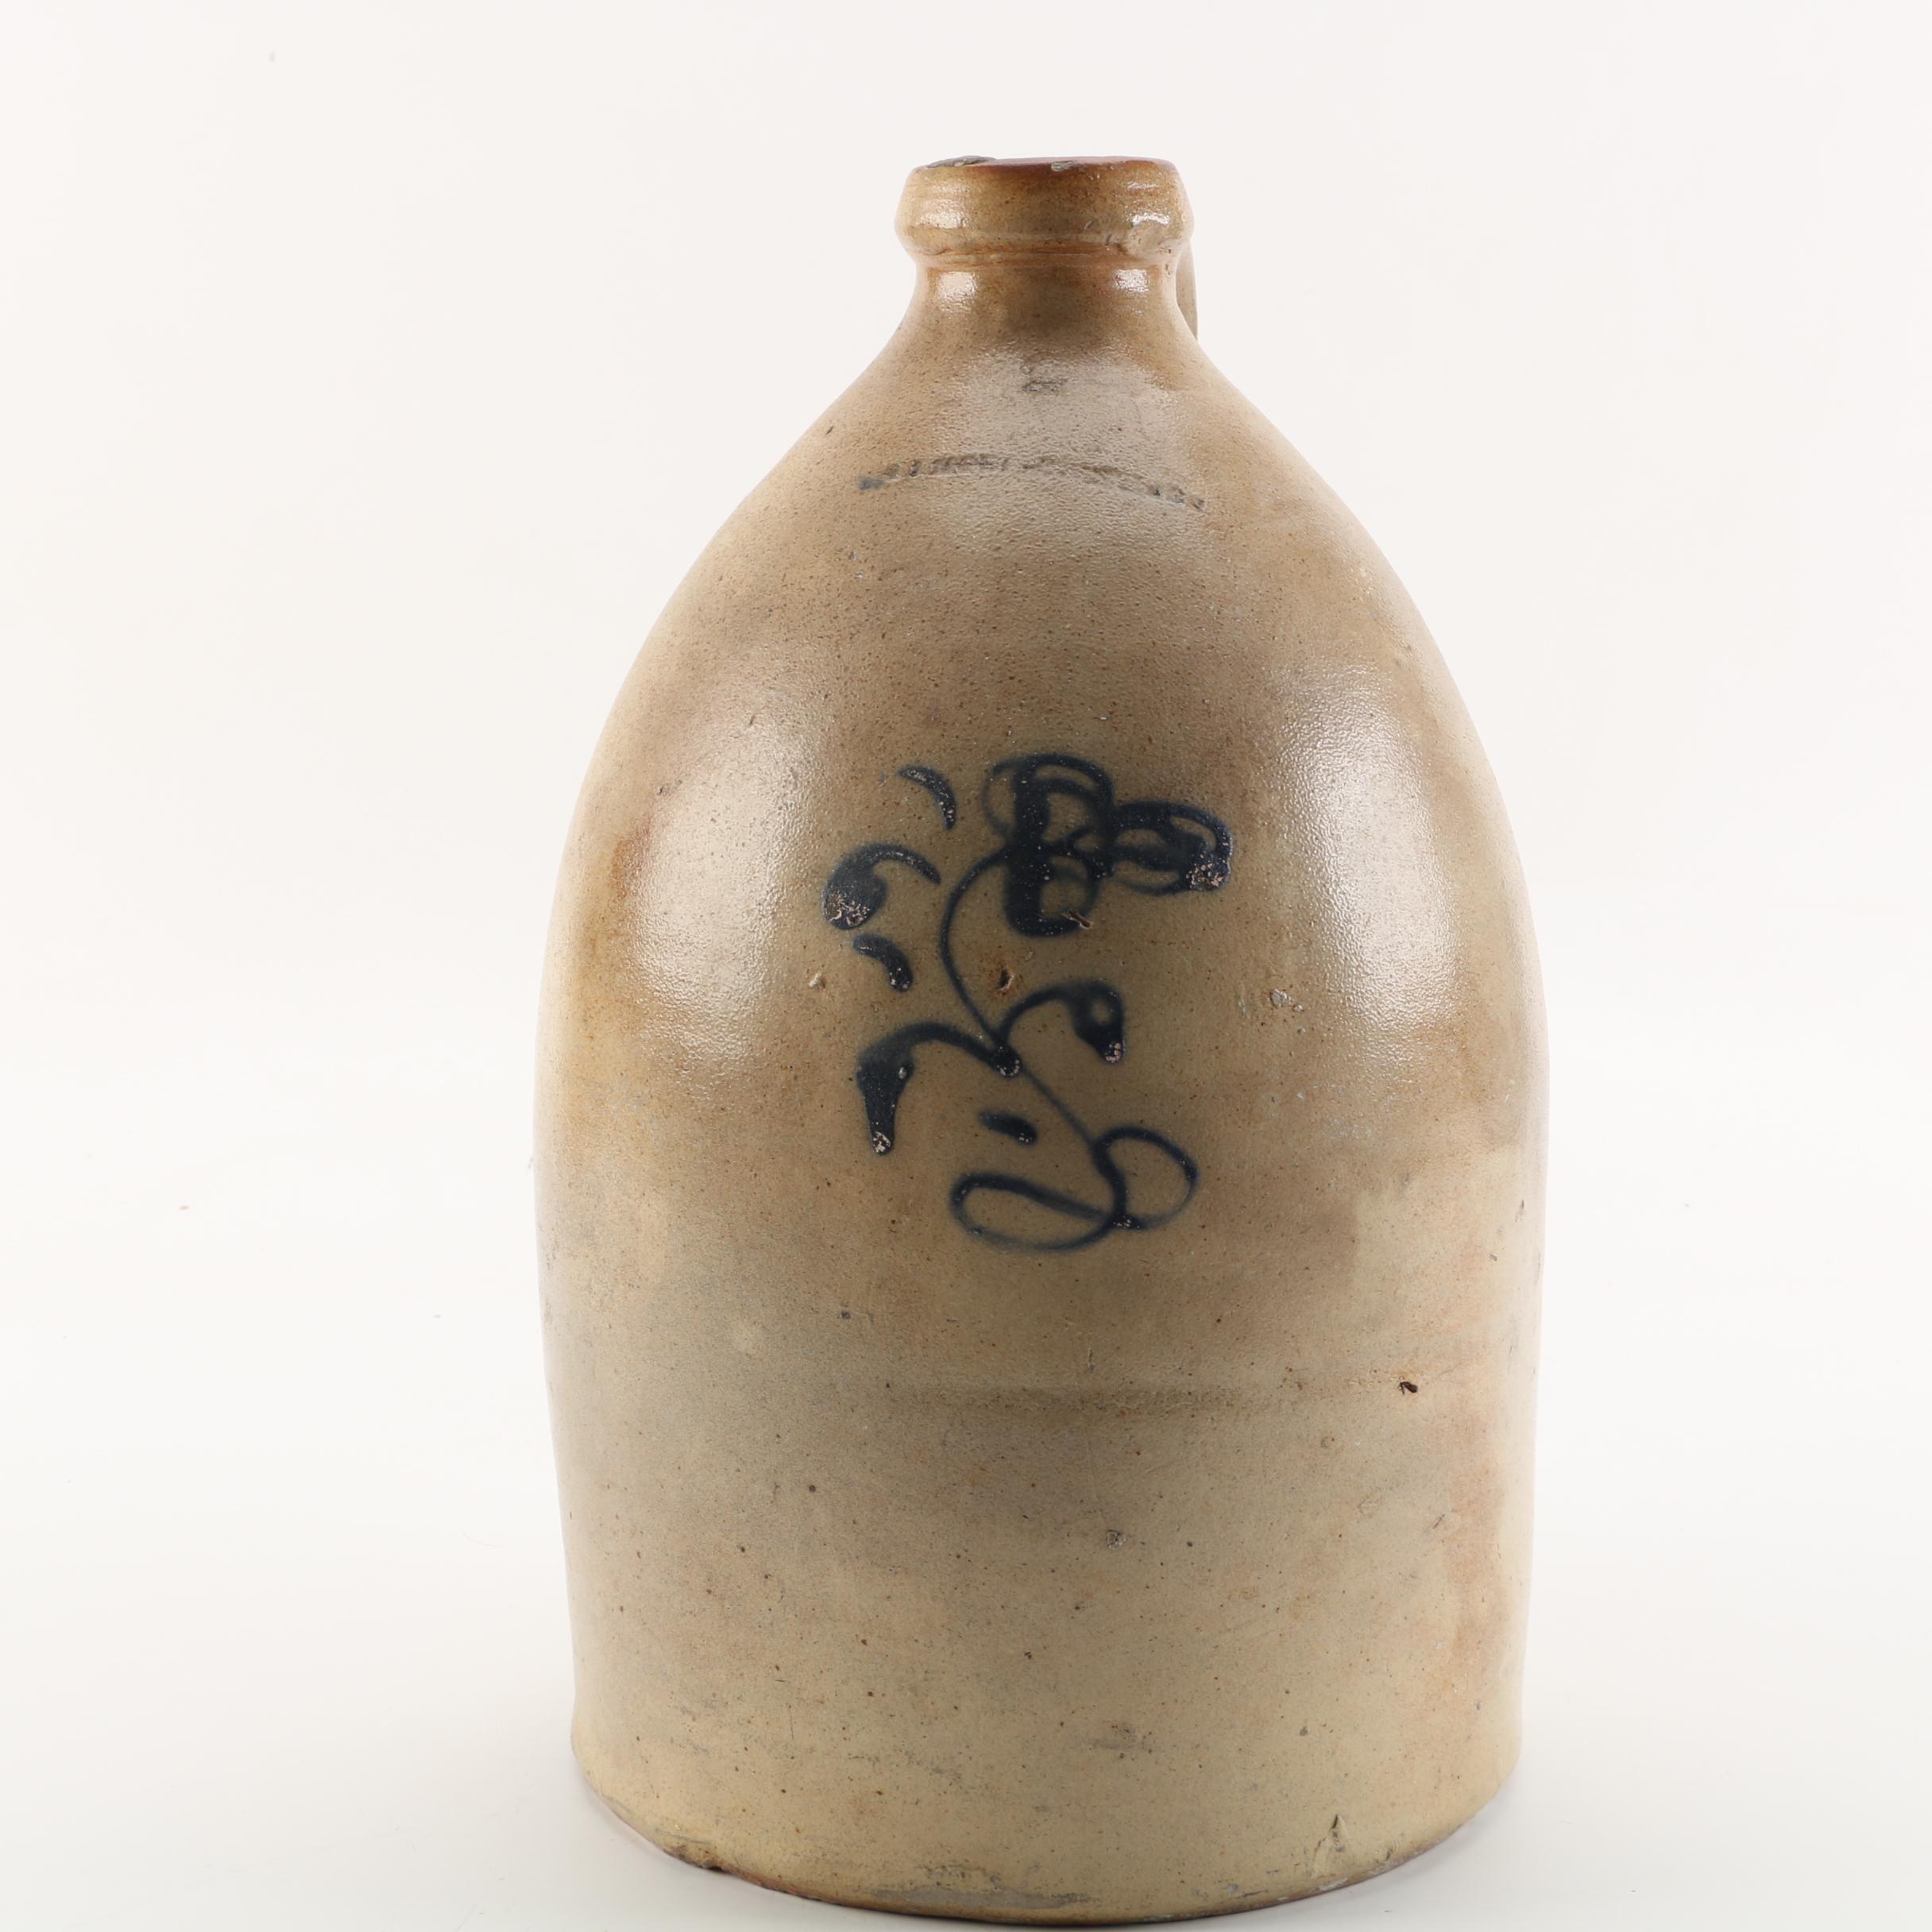 Antique Salt Glazed Stoneware Jug with Blue Underglaze Decoration